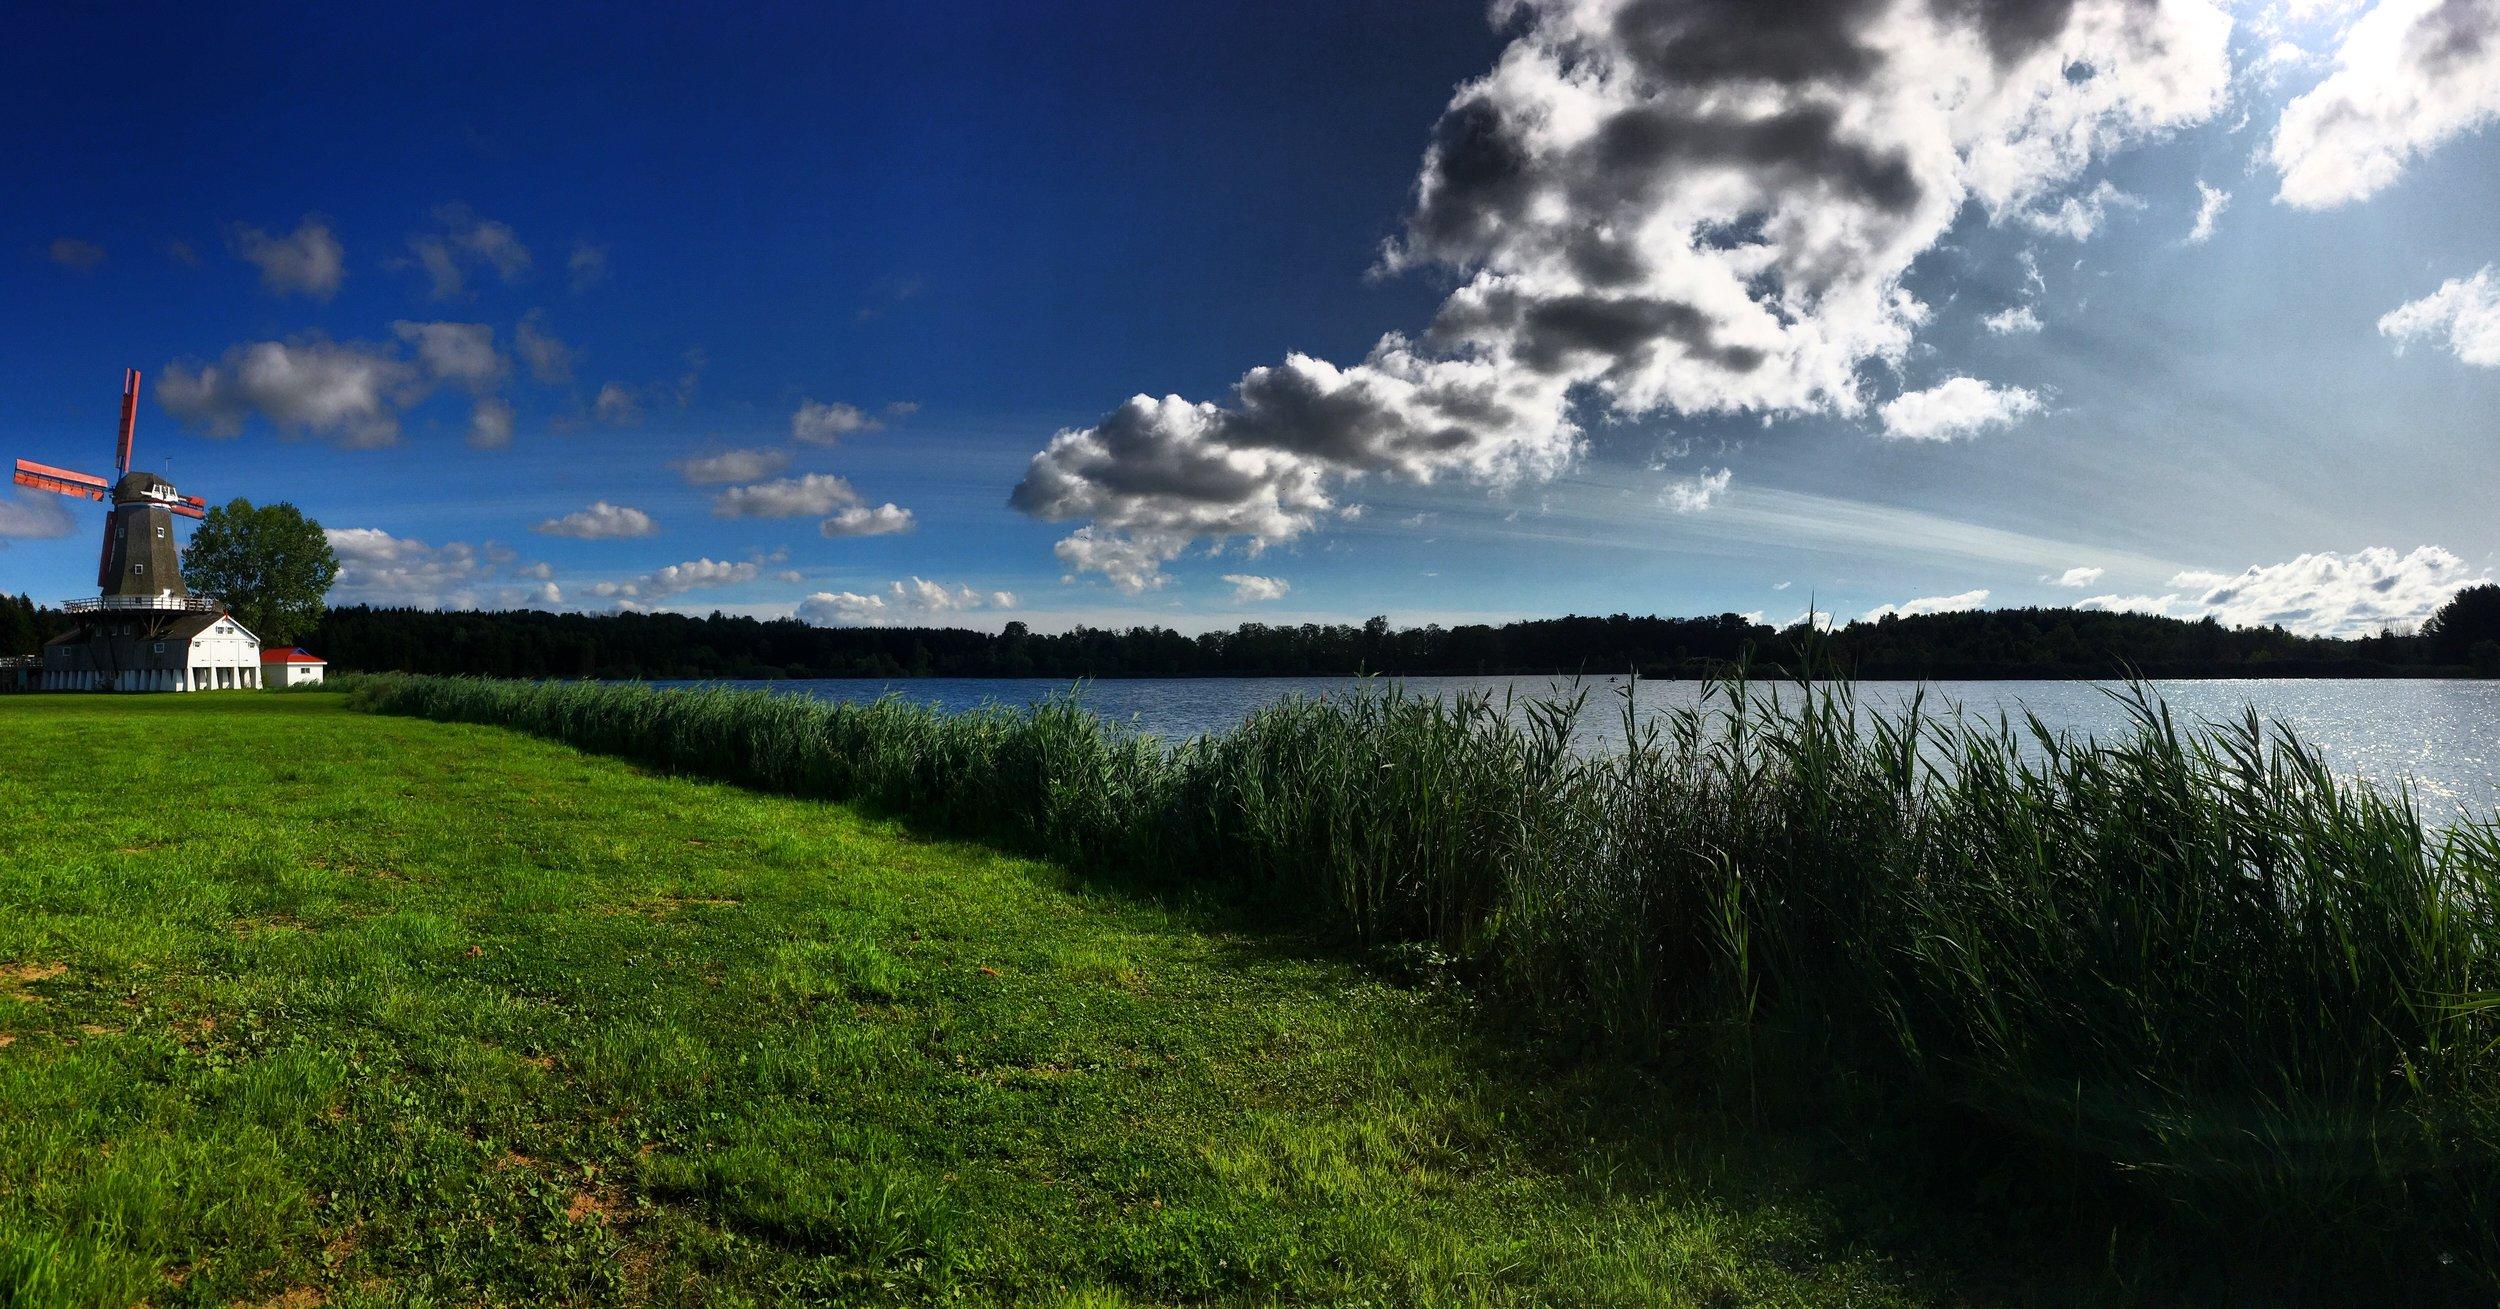 WINDMILL LAKE - WAKE & ECO PARK